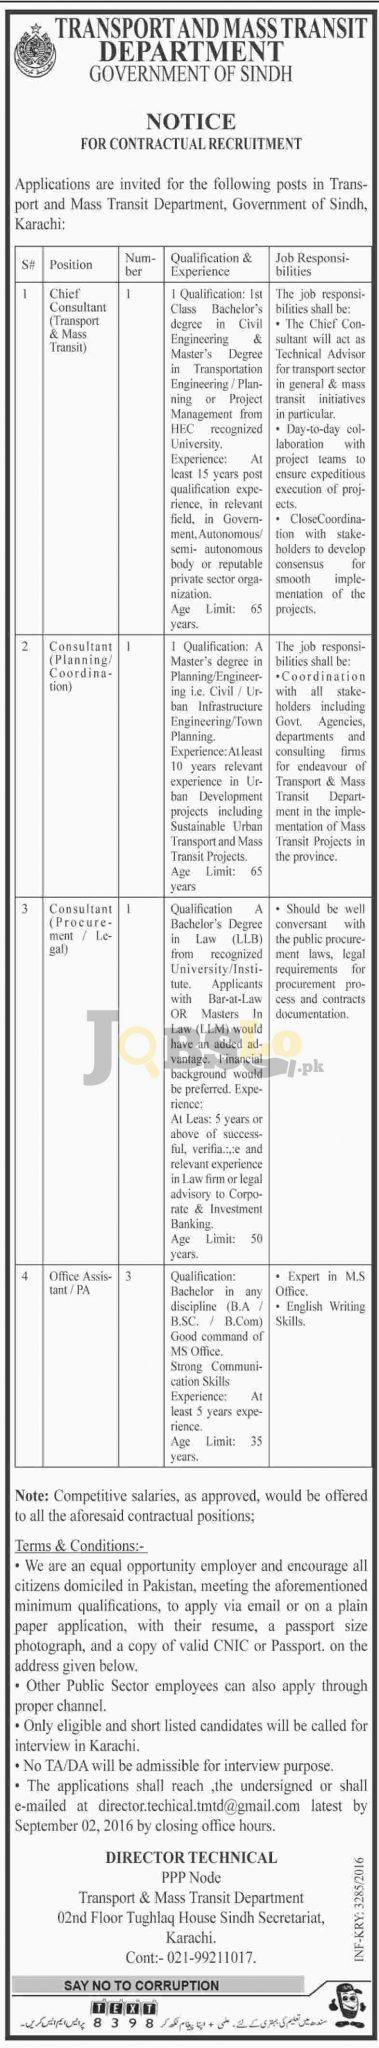 Transport and Mass Transit Department Sindh Jobs 2016 Latest Vacancies in Karachi